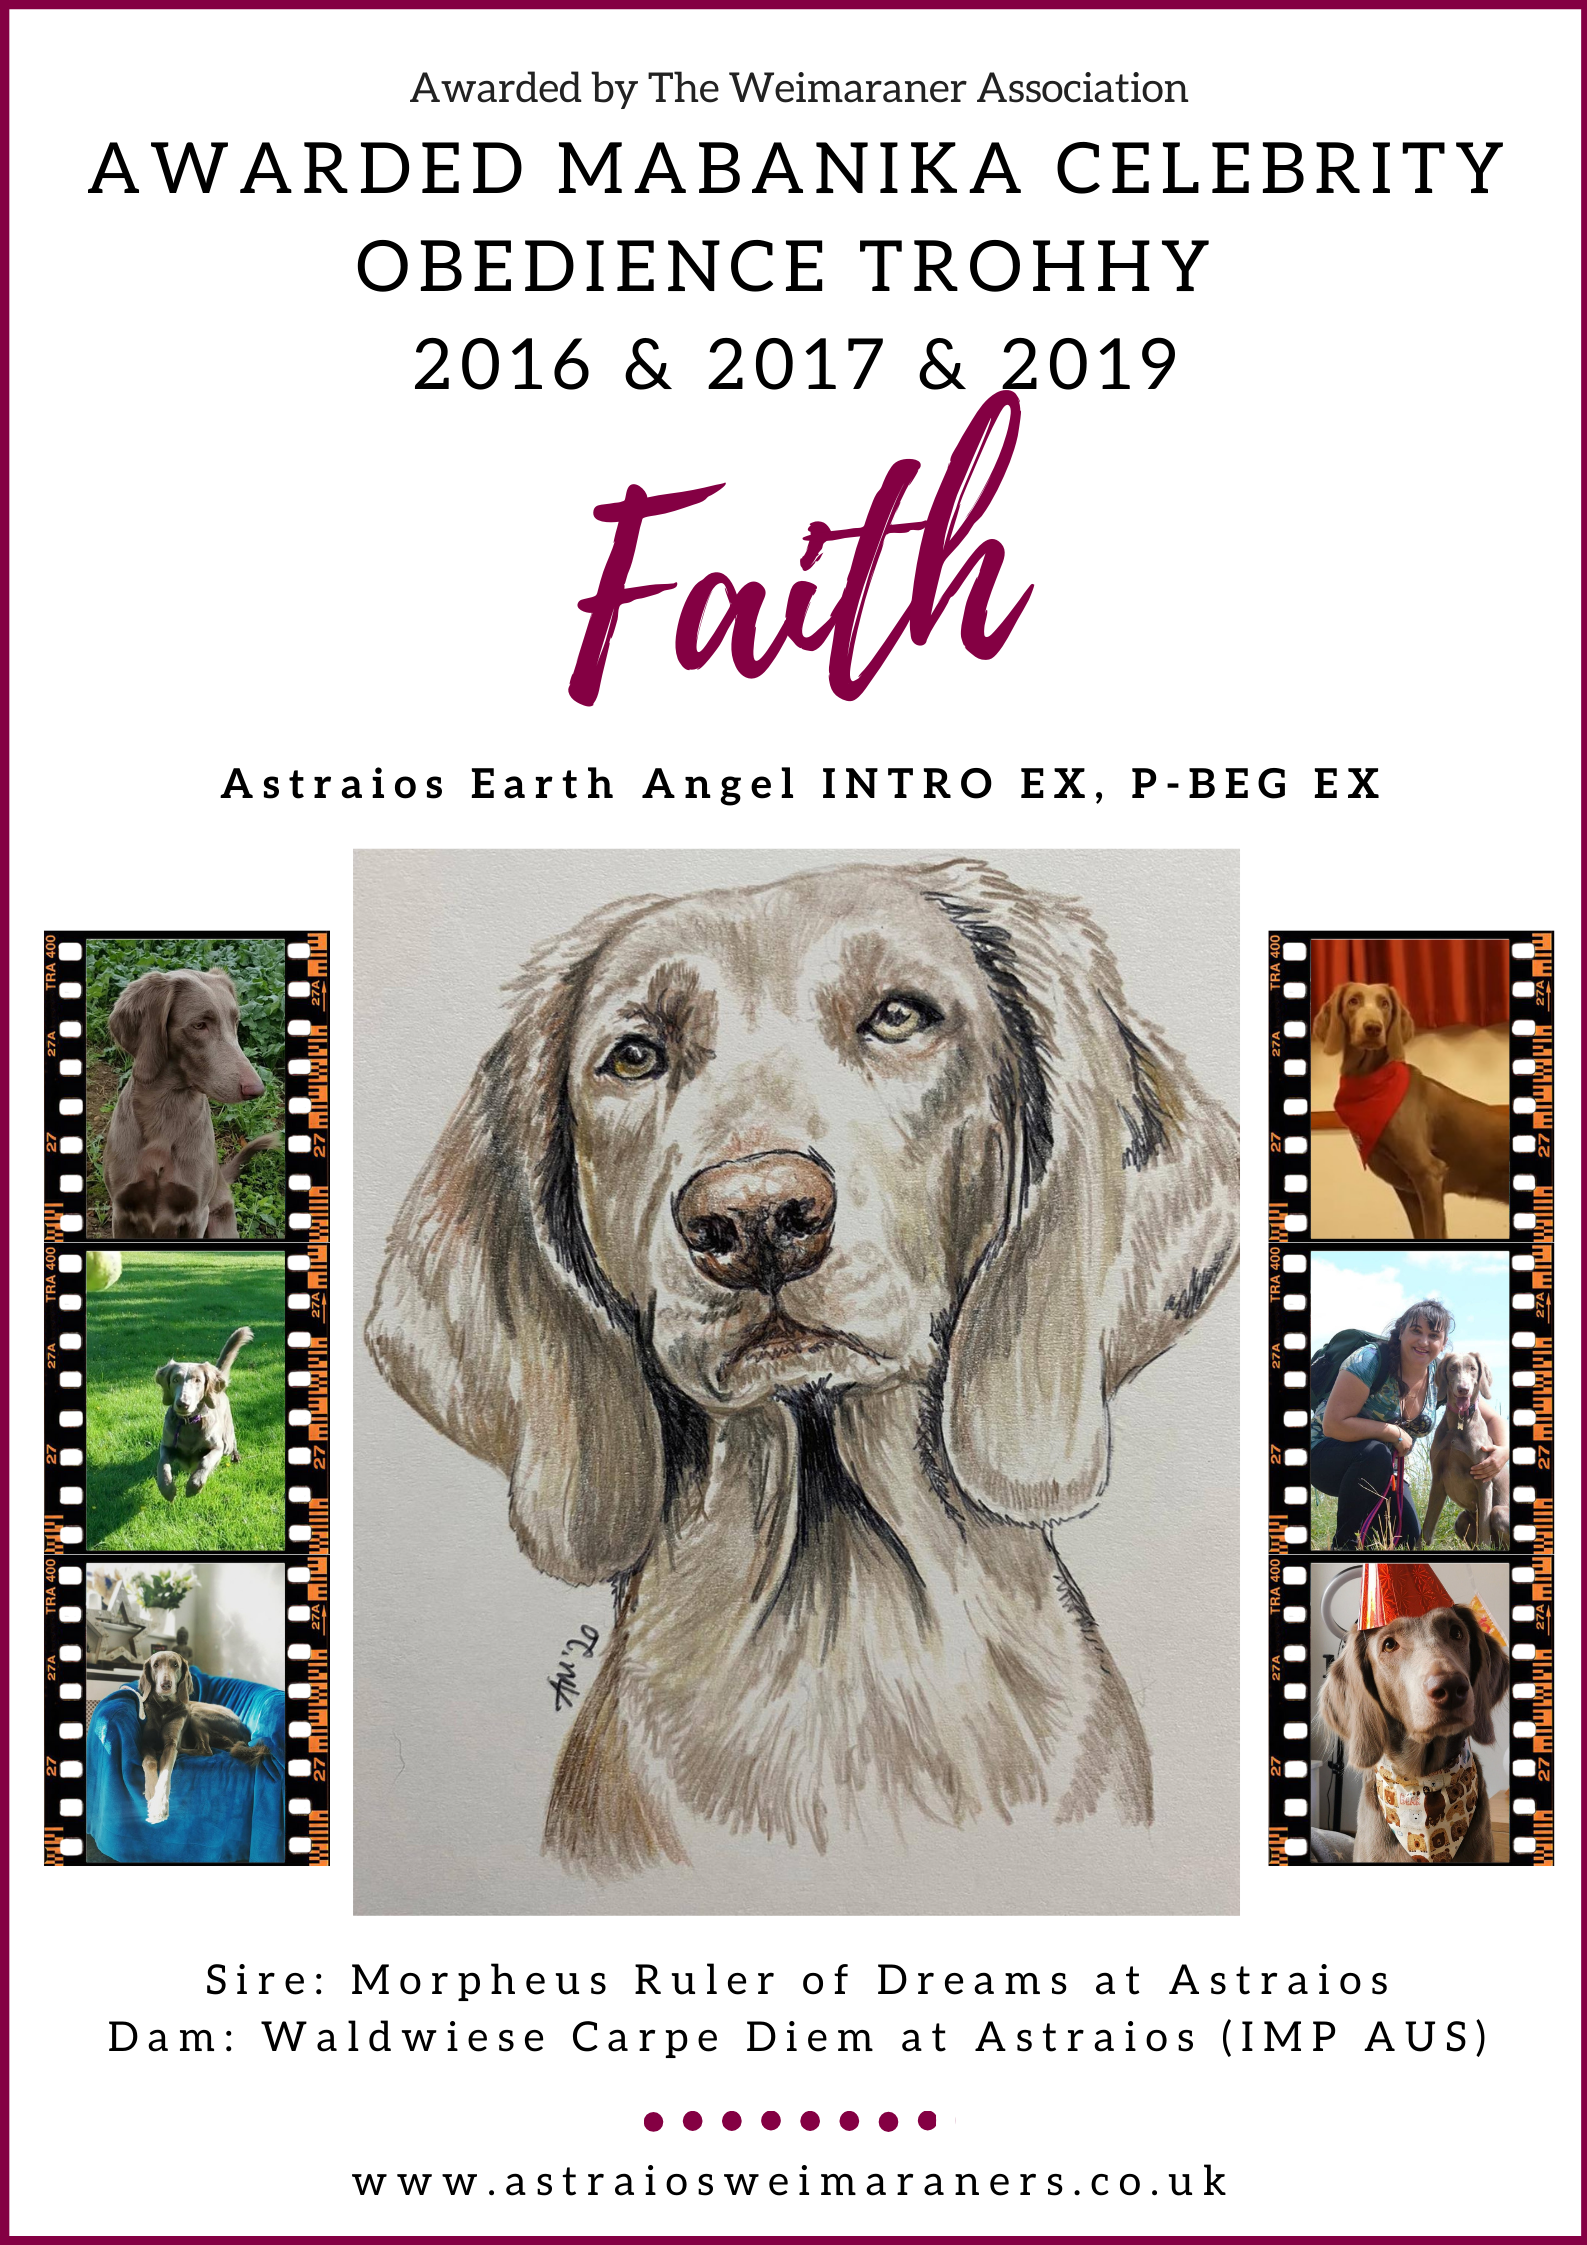 Mabanika Celebrity Obedience Trophy Winner 2019 – Faith (Astraios Earth Angel P-BEG EX)